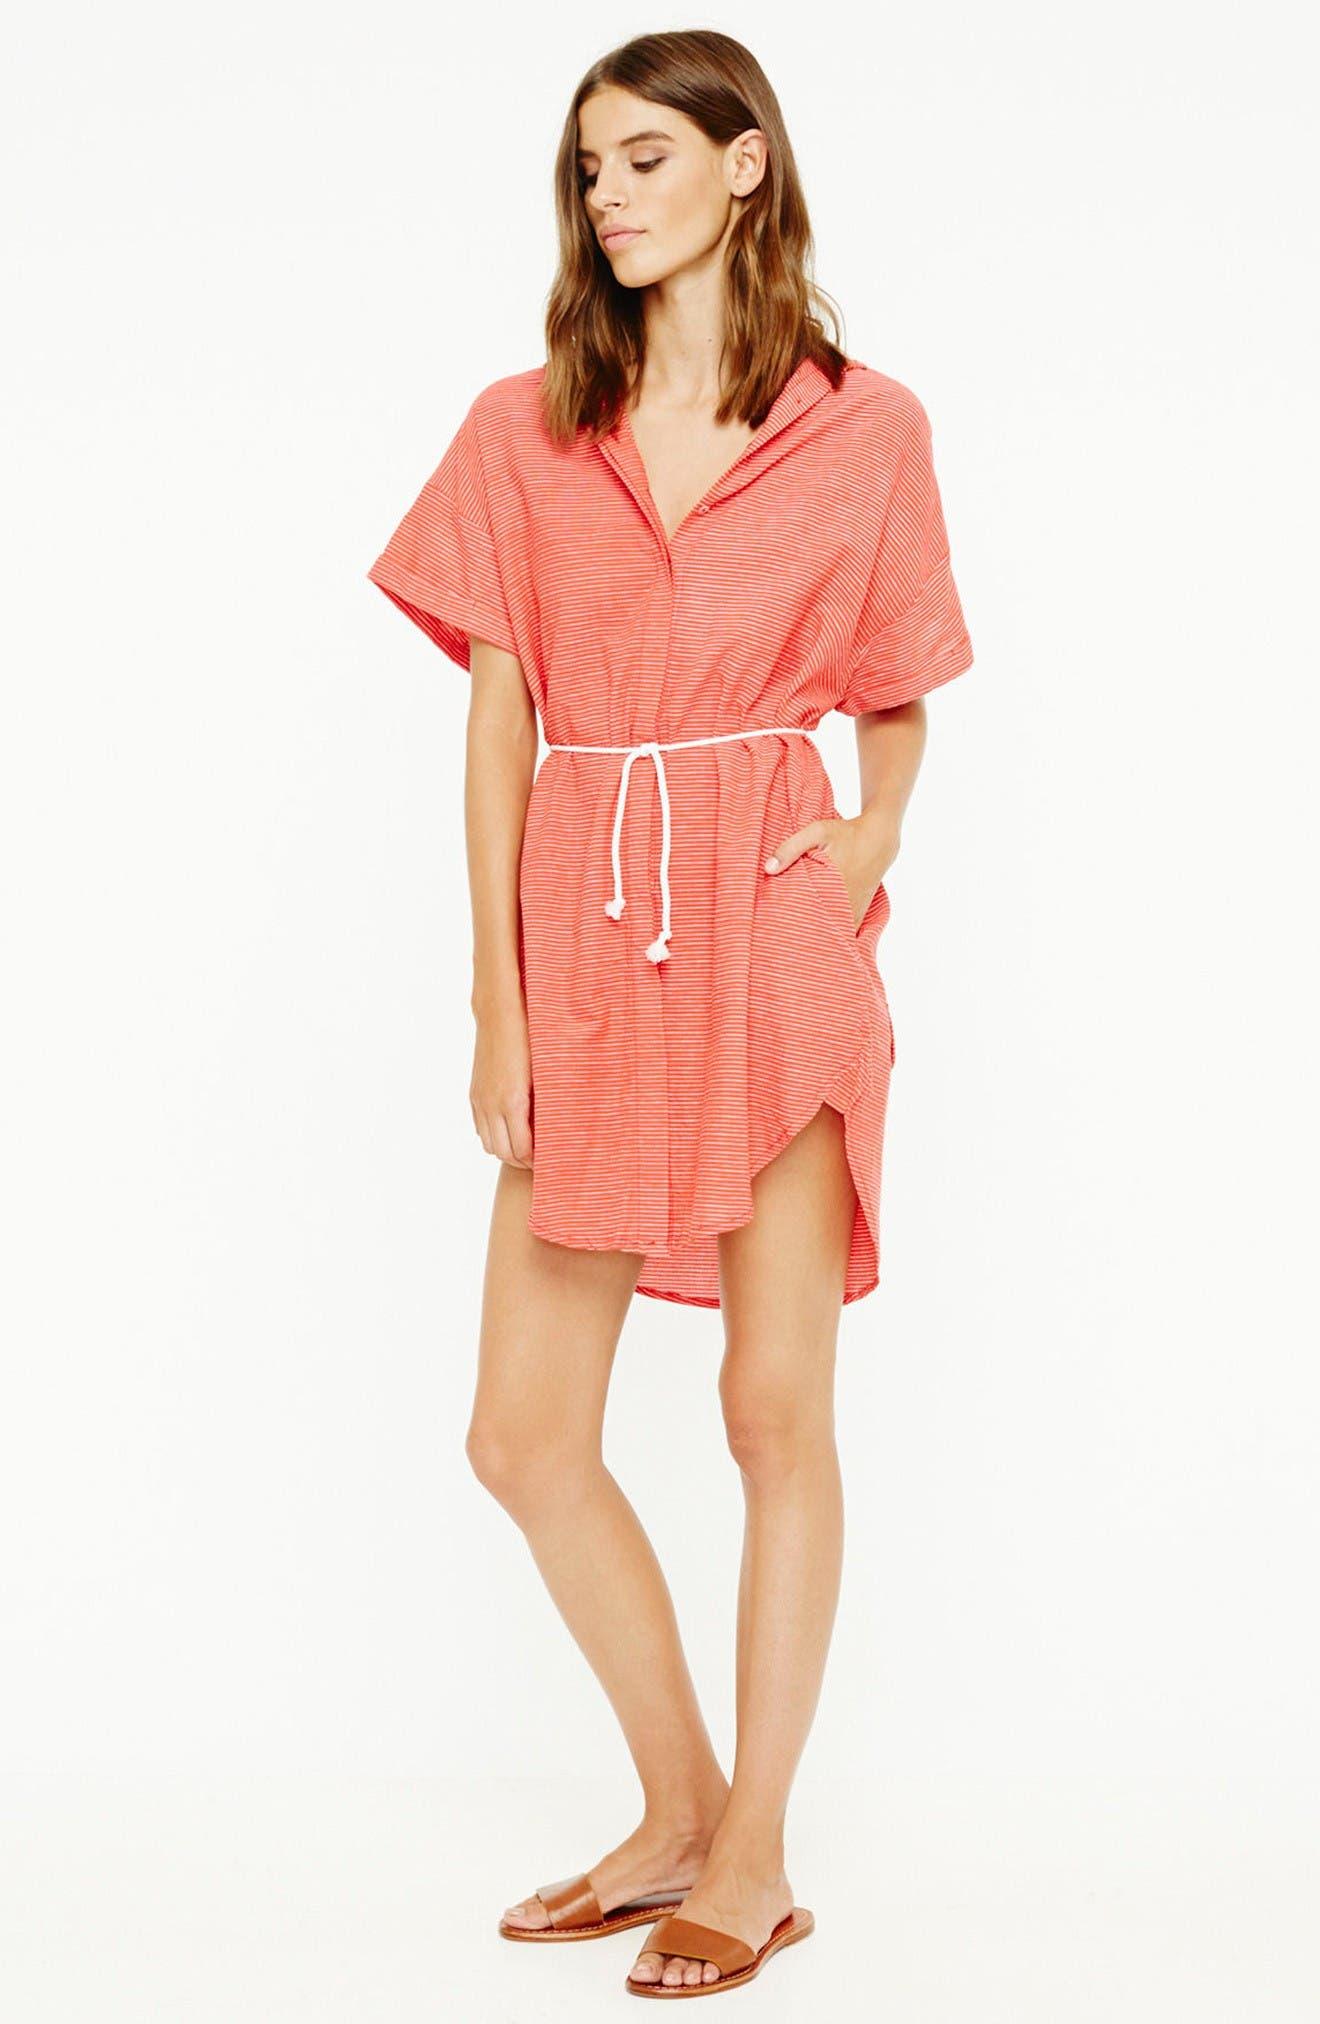 Avalon Cotton Shirtdress,                             Alternate thumbnail 2, color,                             Deep Sea Print Red